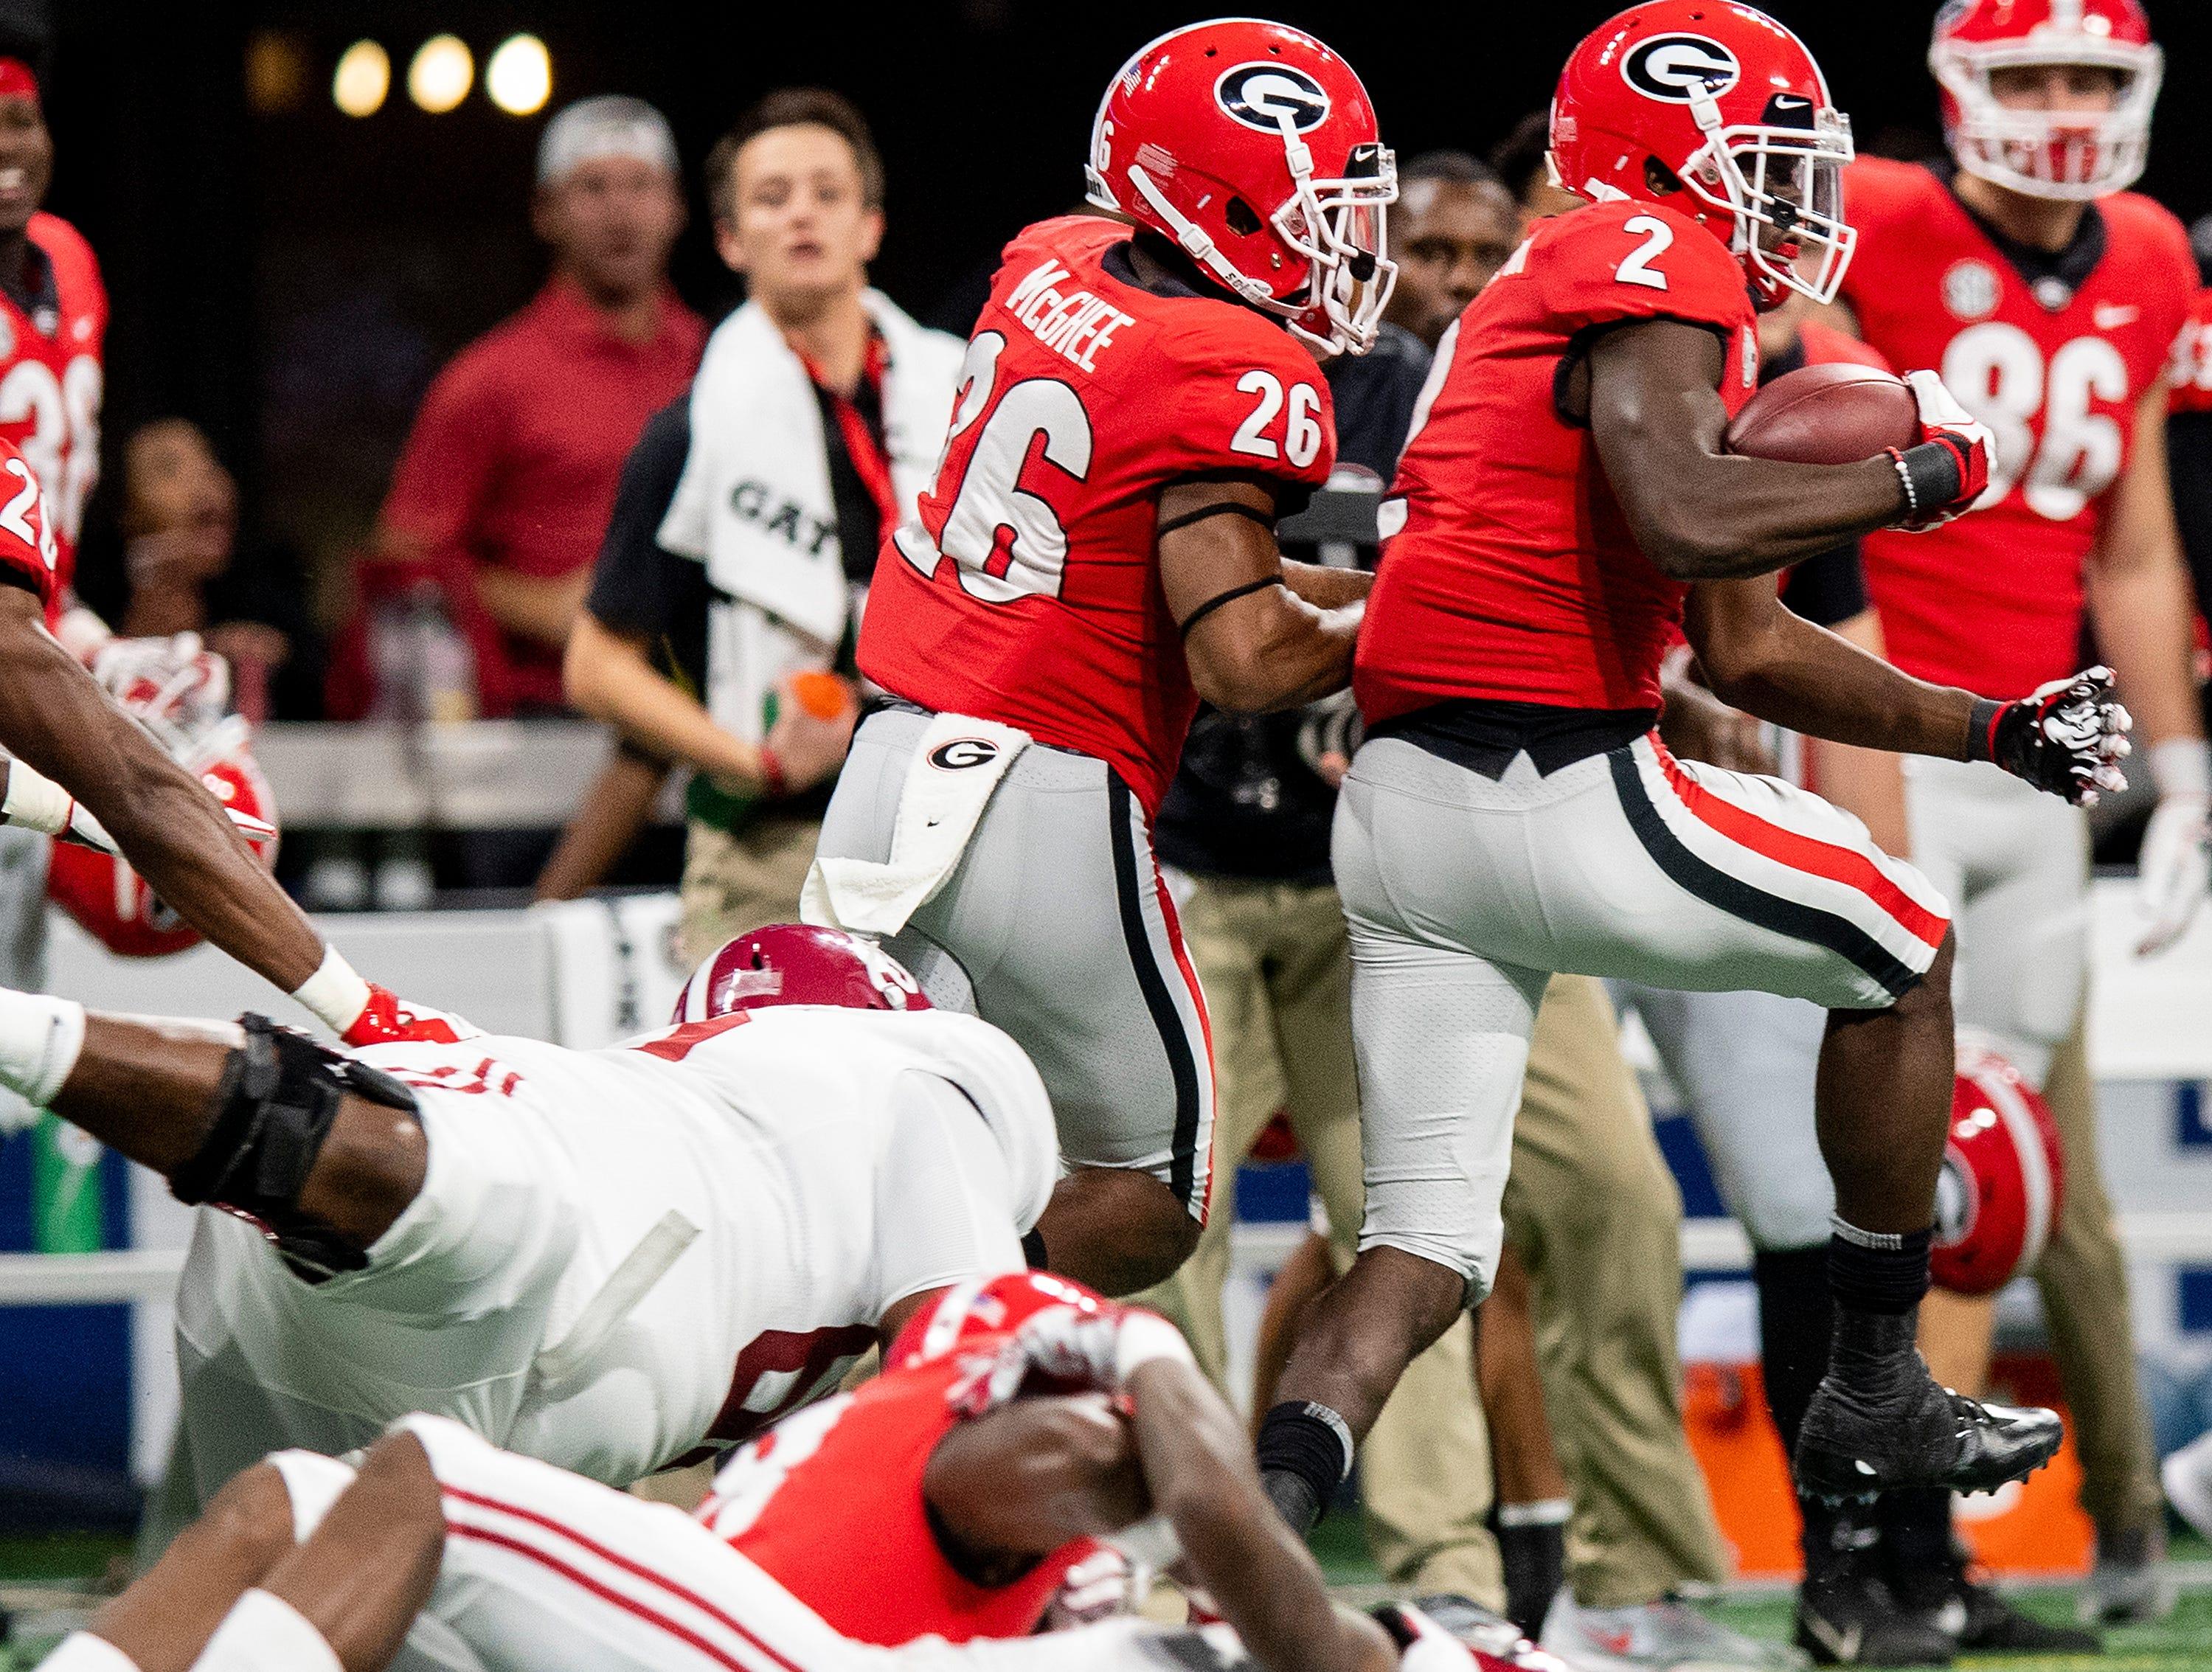 Georgia defensive back Richard LeCounte (2) returns an interception against Alabama during first half action of the SEC Championship Game at Mercedes Benz Stadium in Atlanta, Ga., on Saturday December 1, 2018.